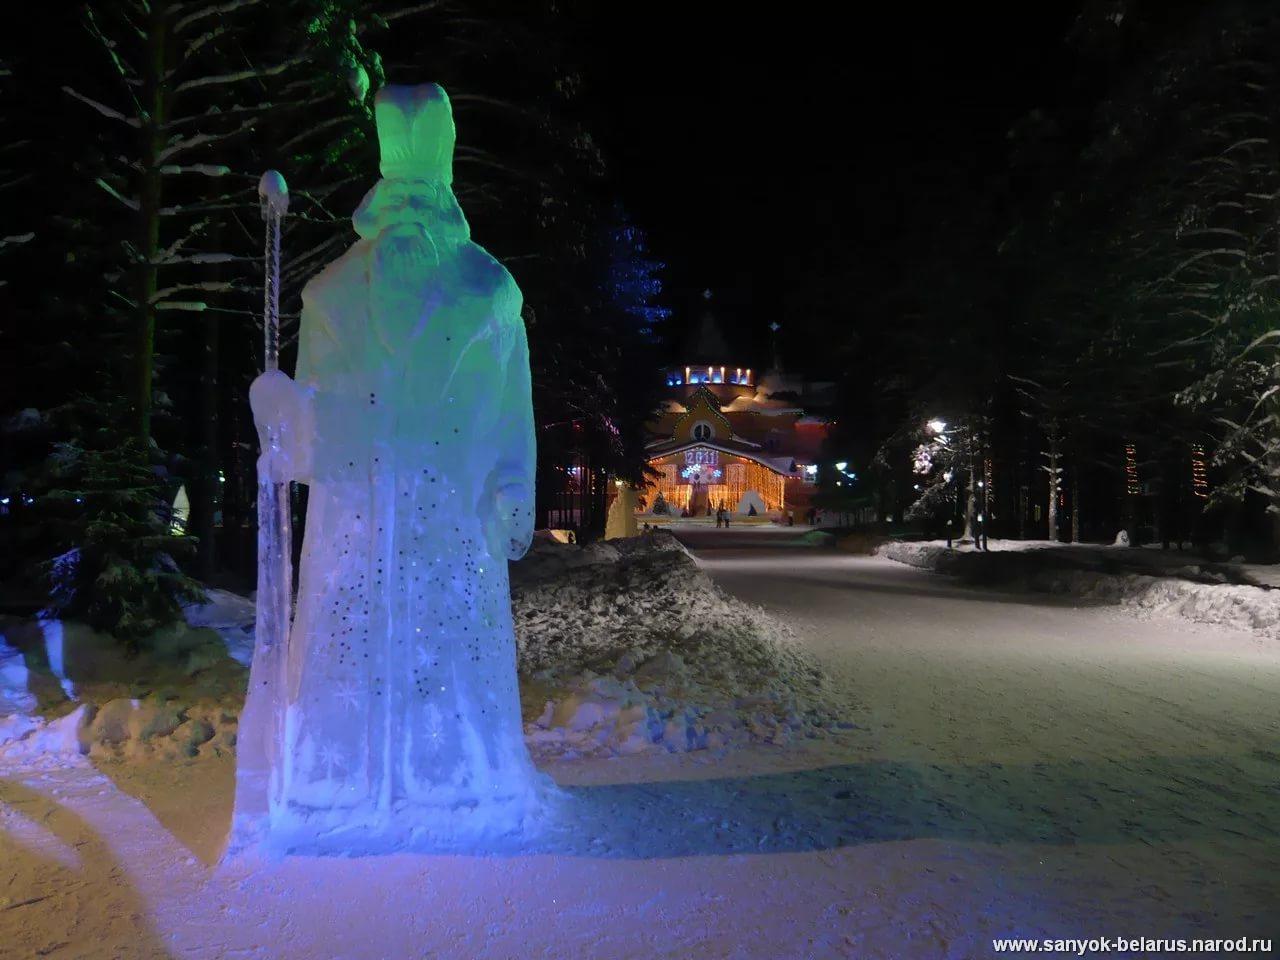 Зимний сад, Великий Устюг